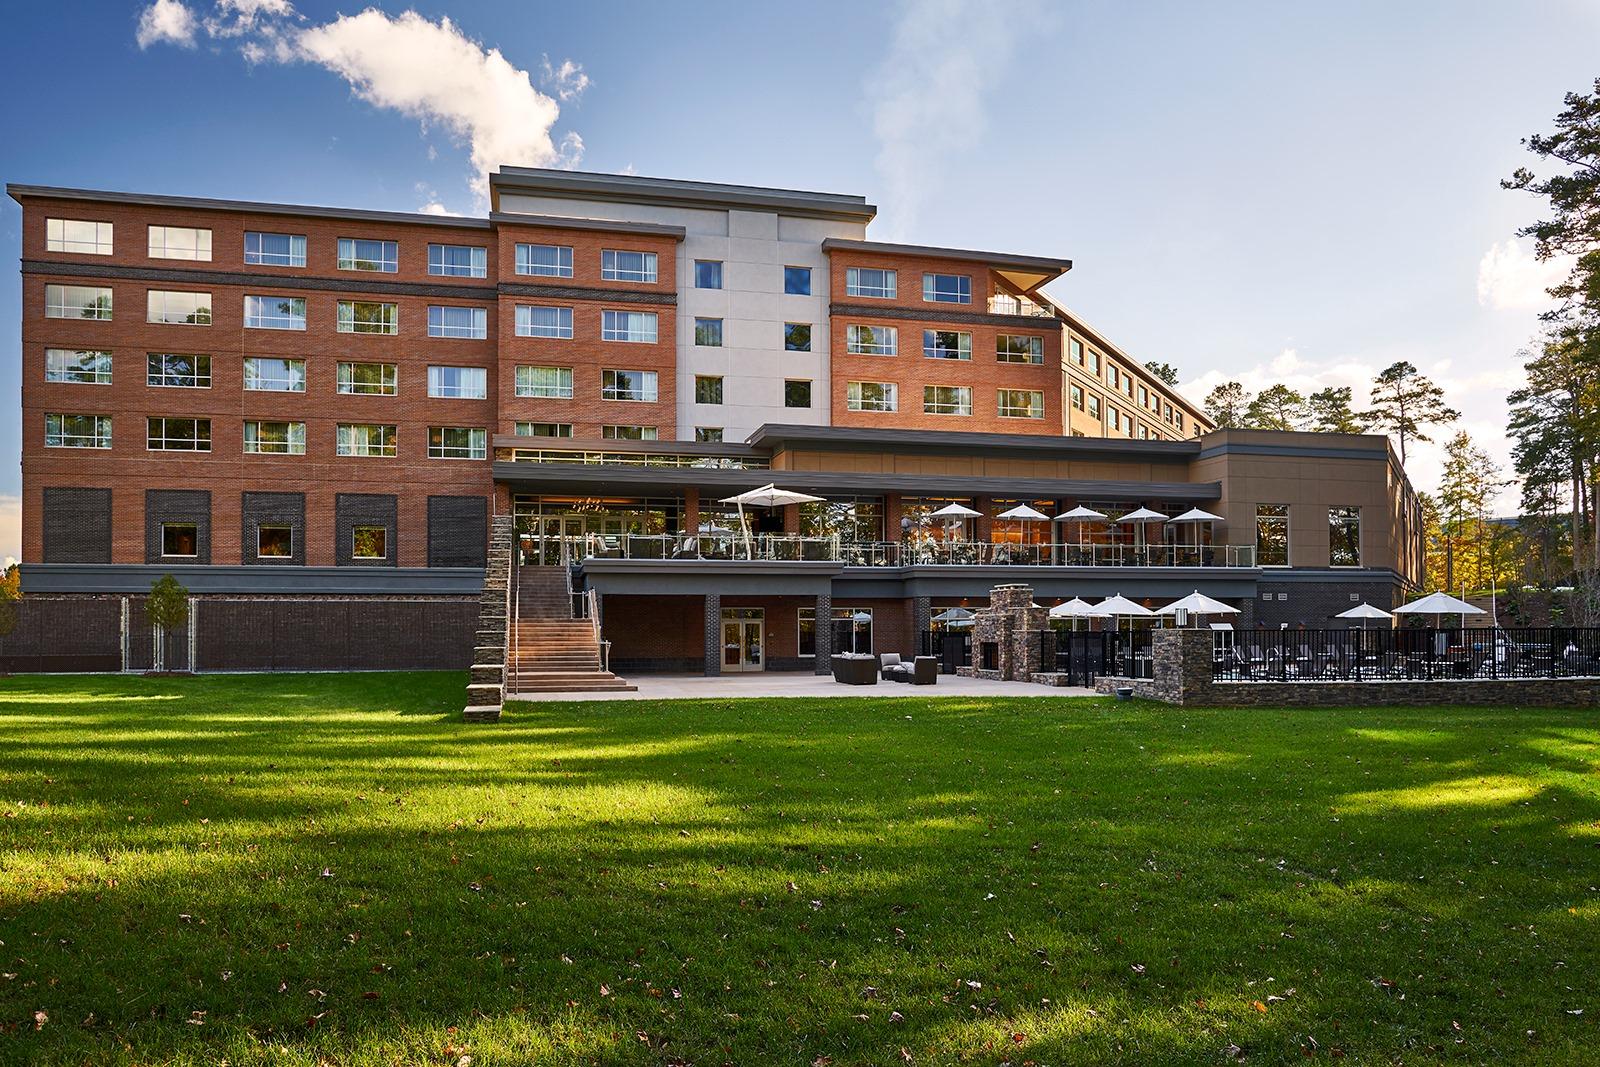 stateview hotel - raleigh north carolina